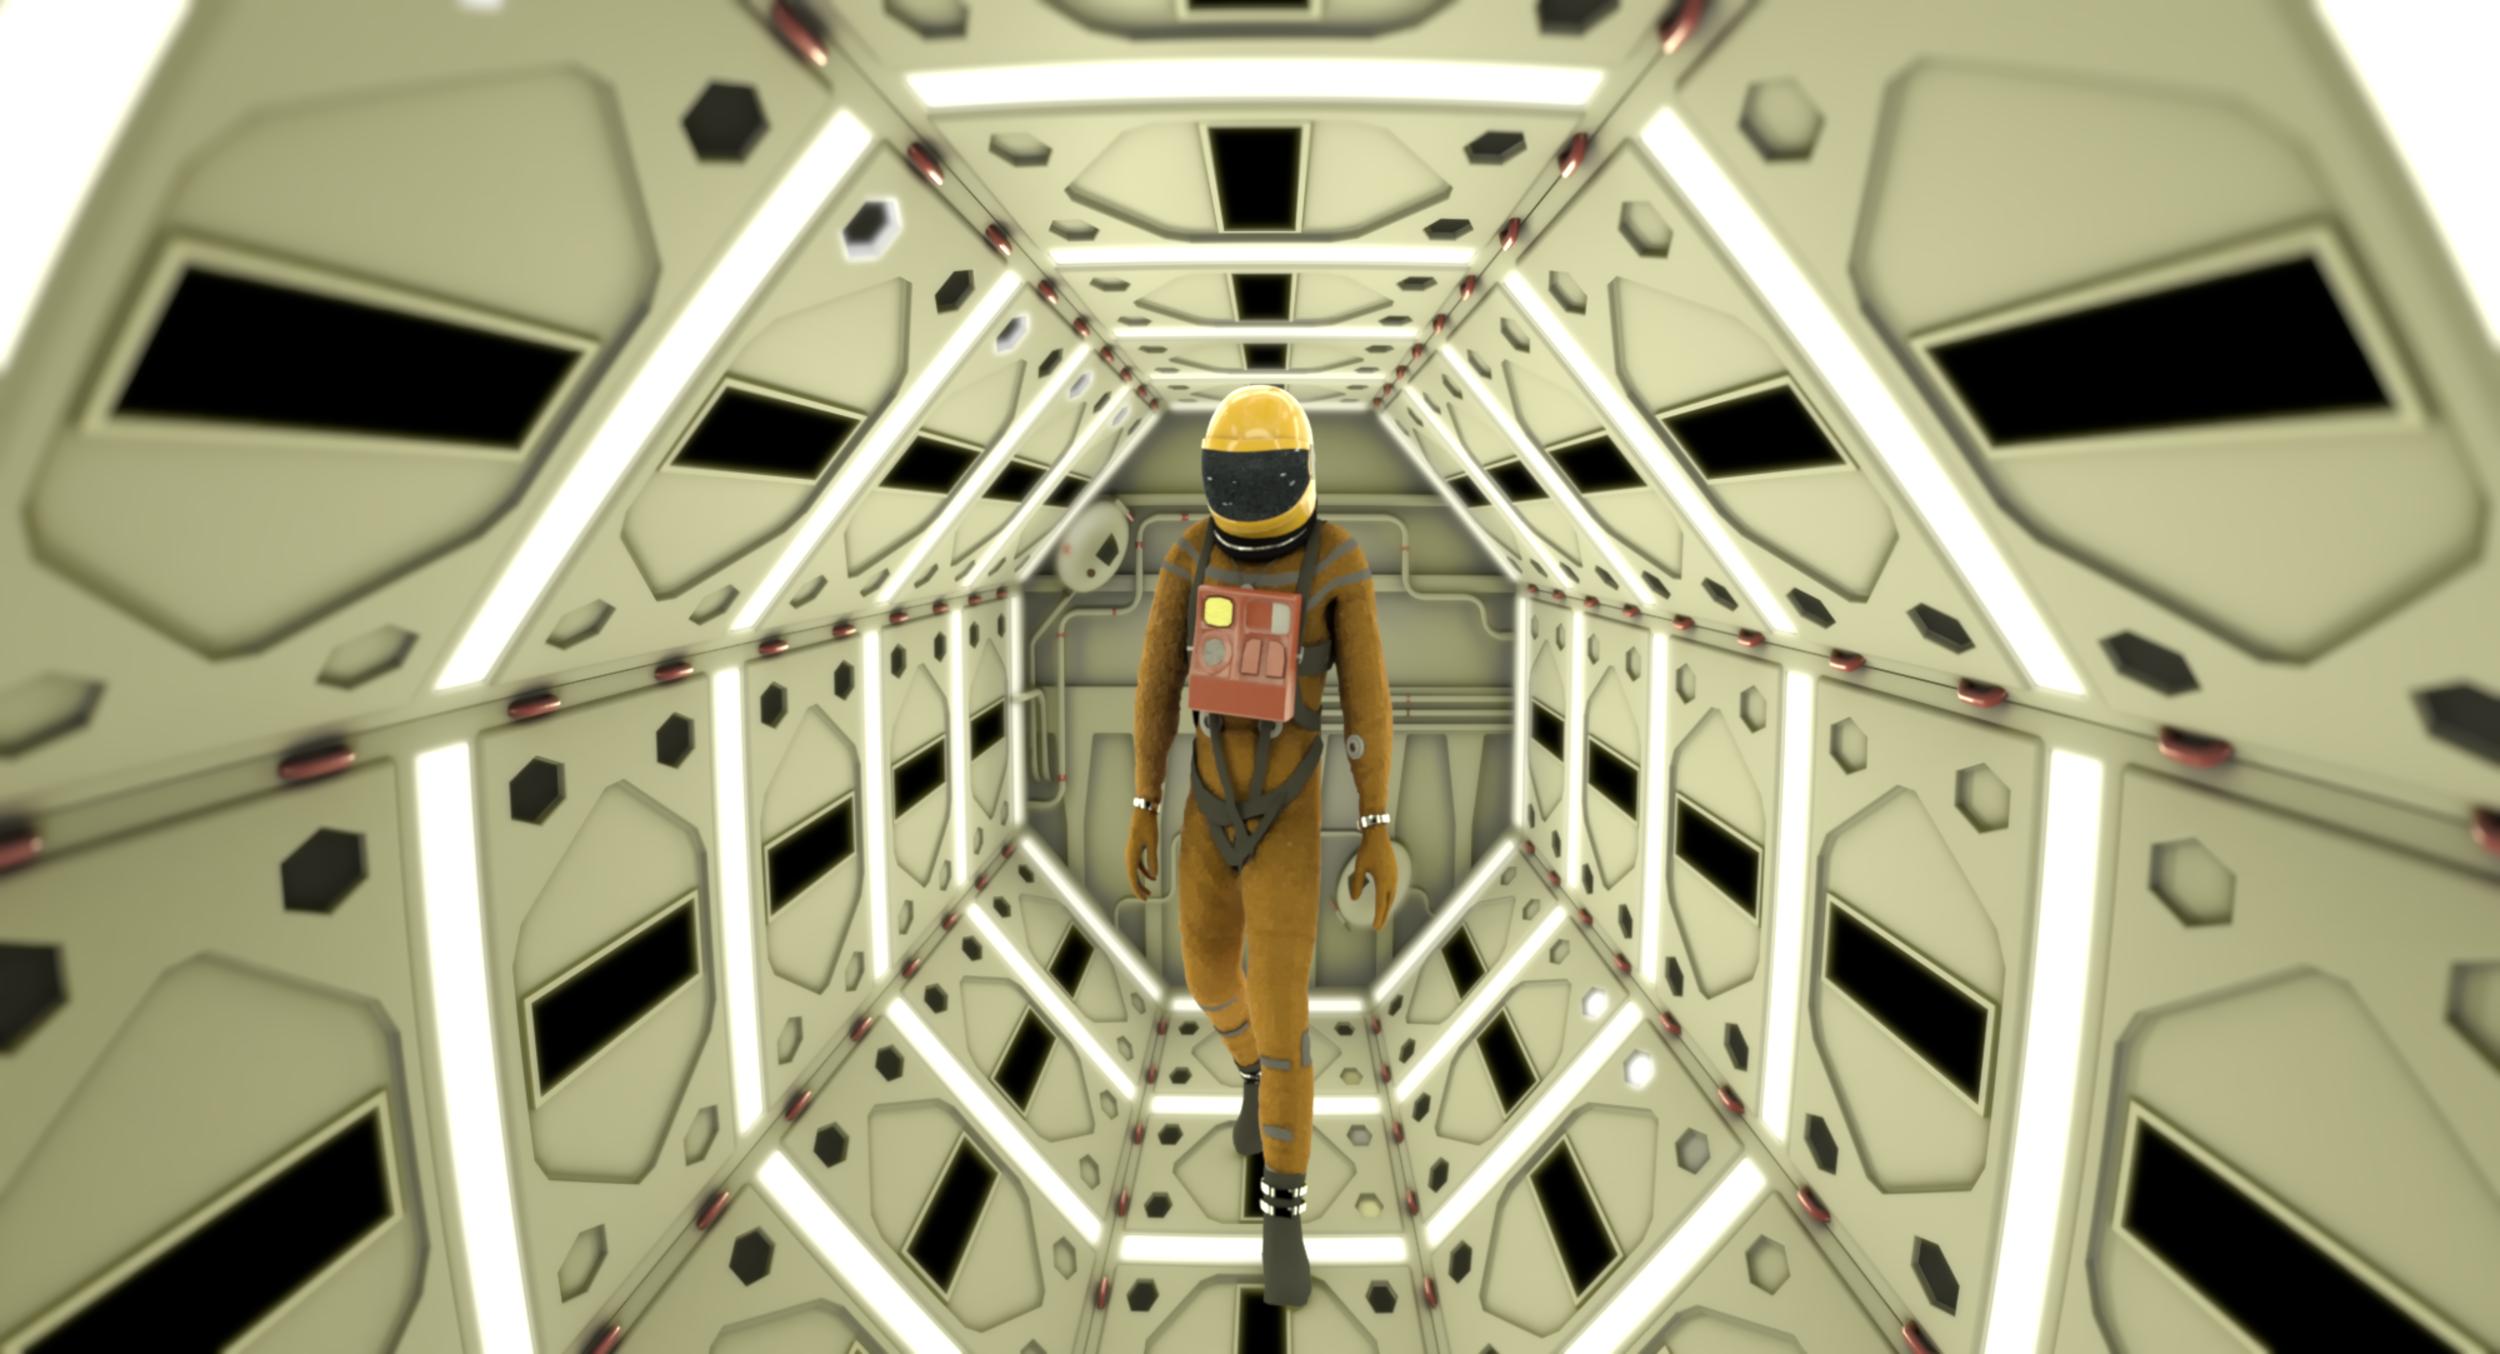 2001 Space Odyssey CG Frame Match